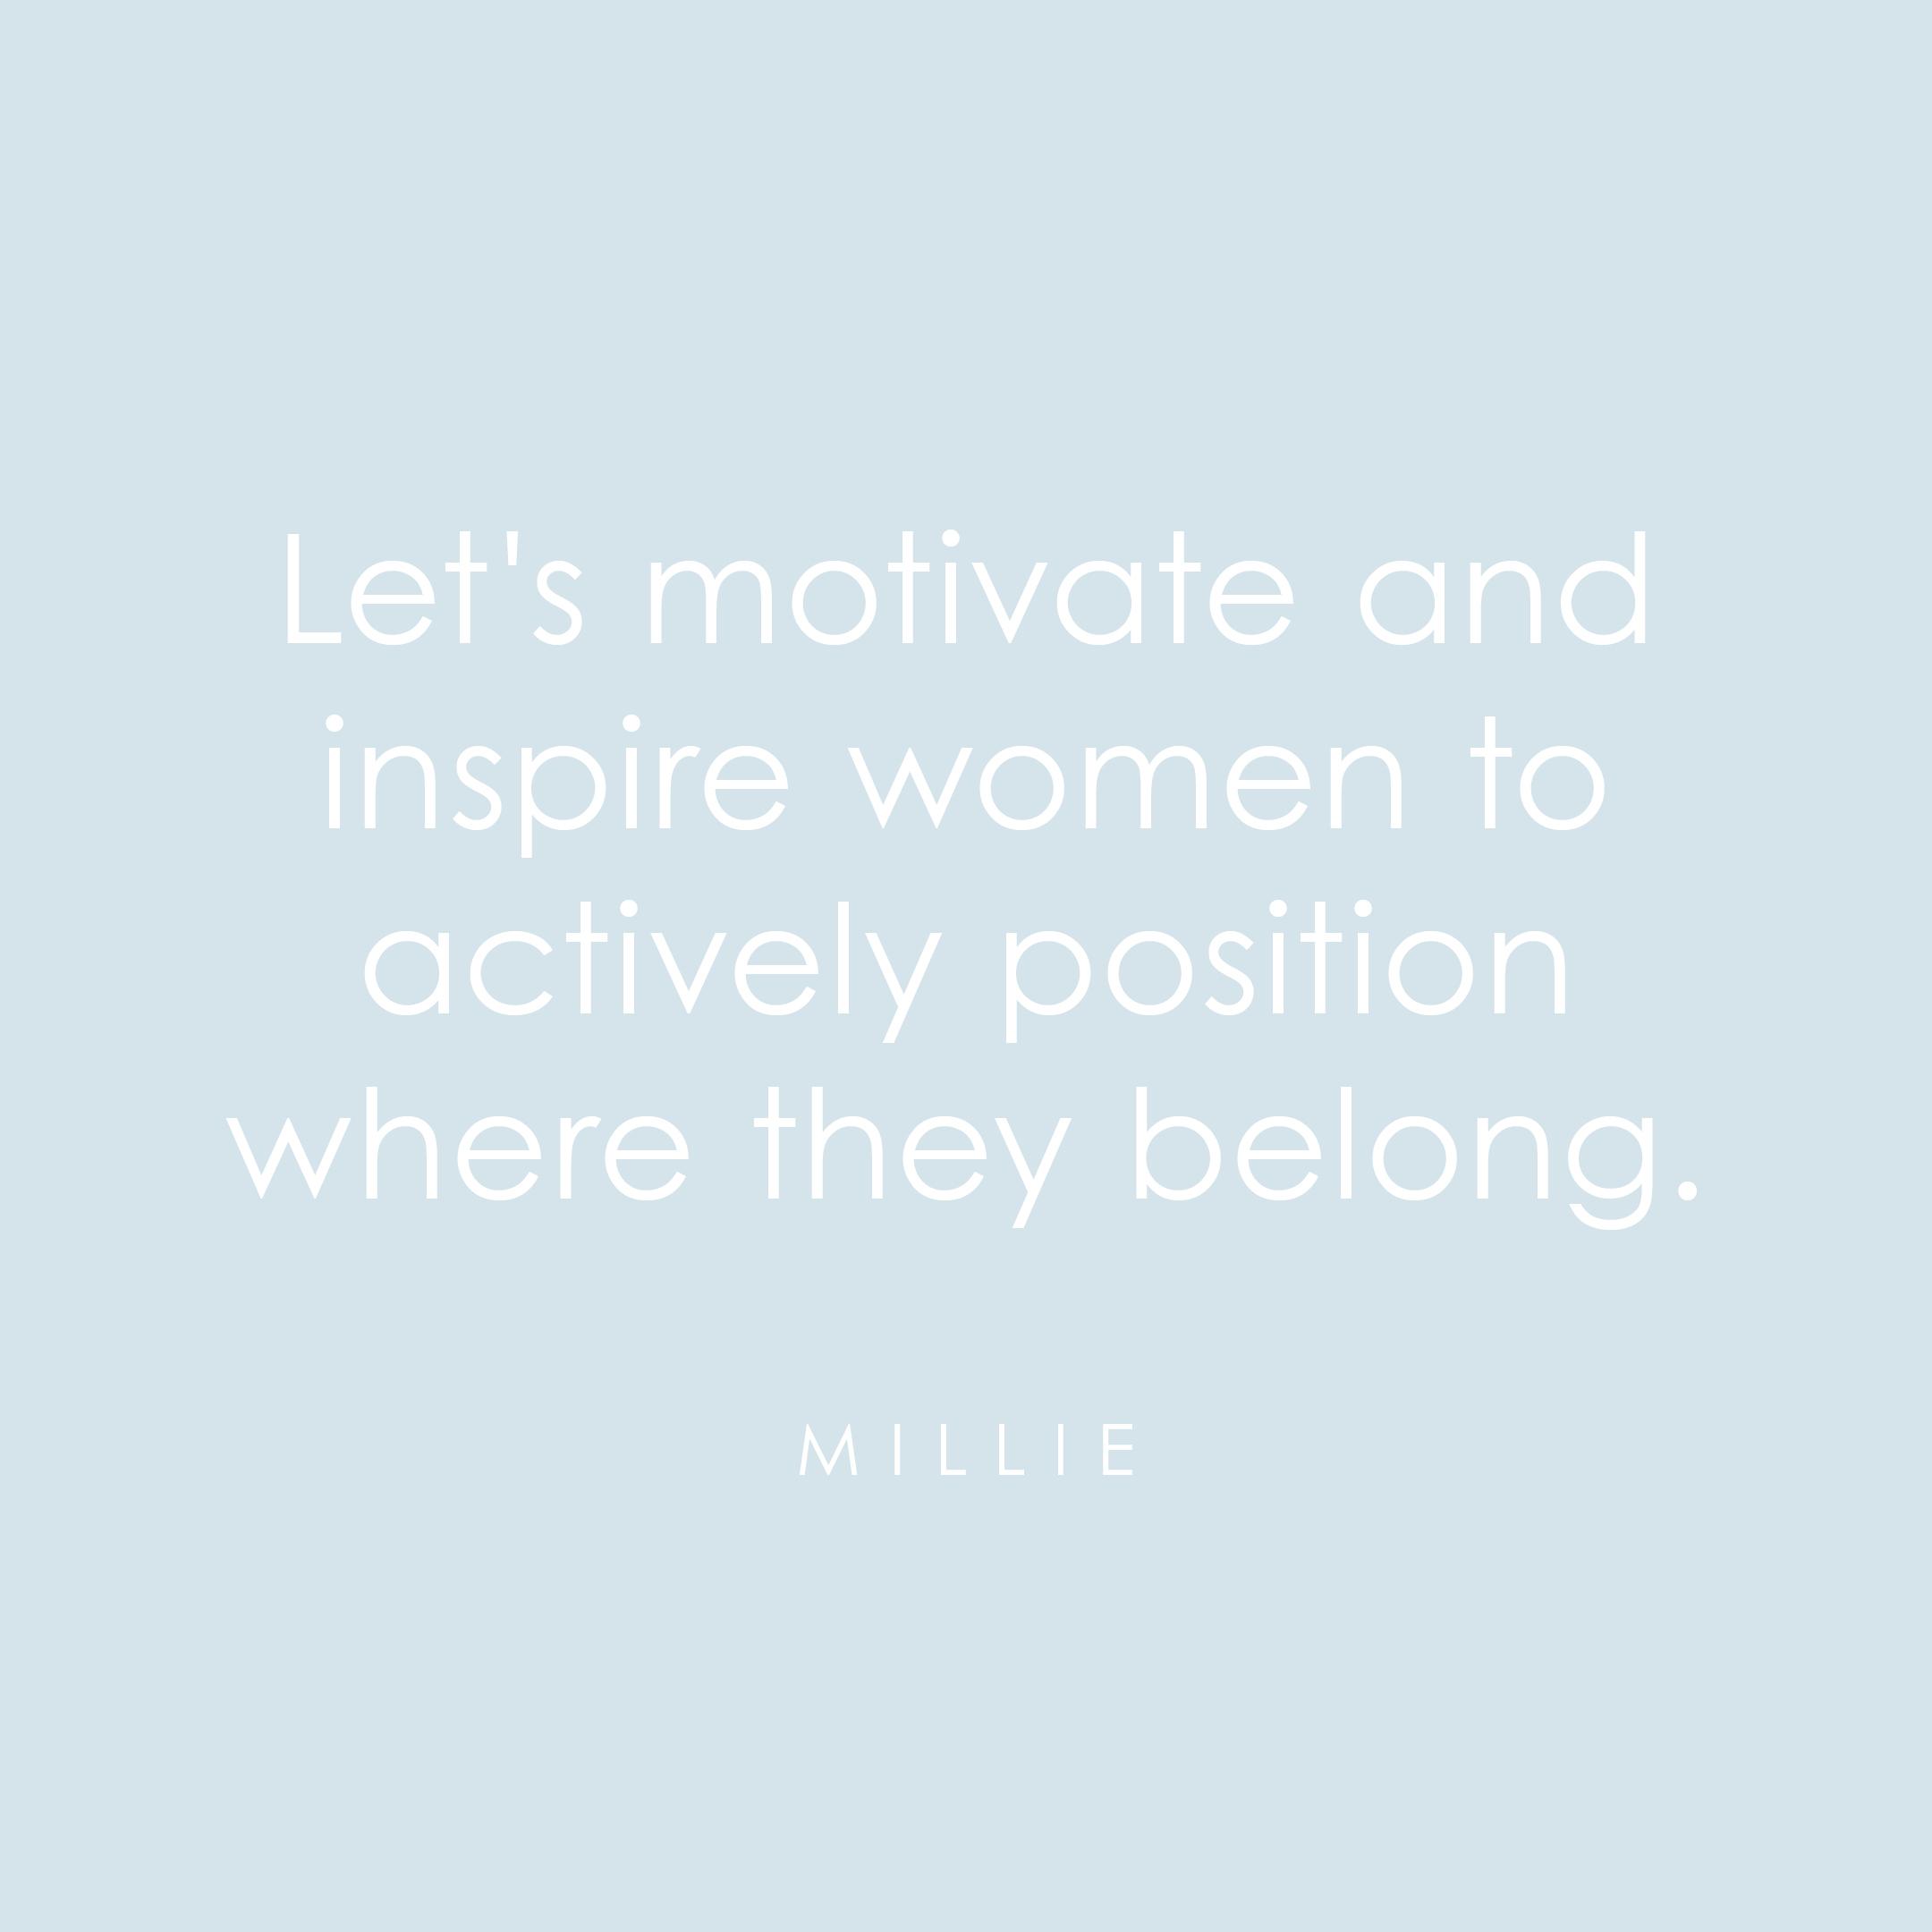 Millie_instagram quotes_Oct_v1-1a.jpg